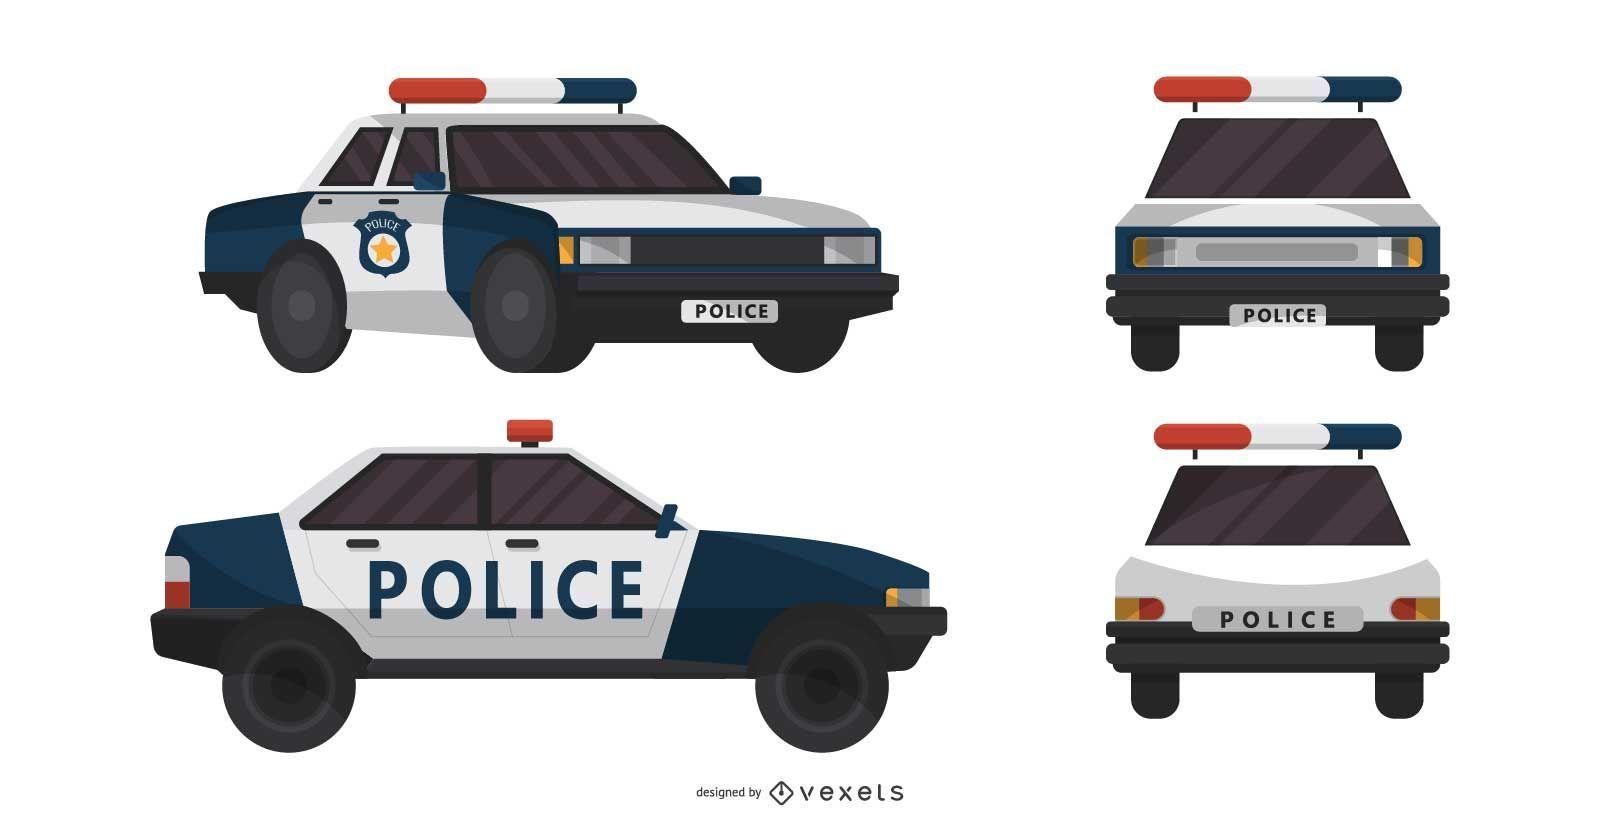 Police Car Different Views Illustration